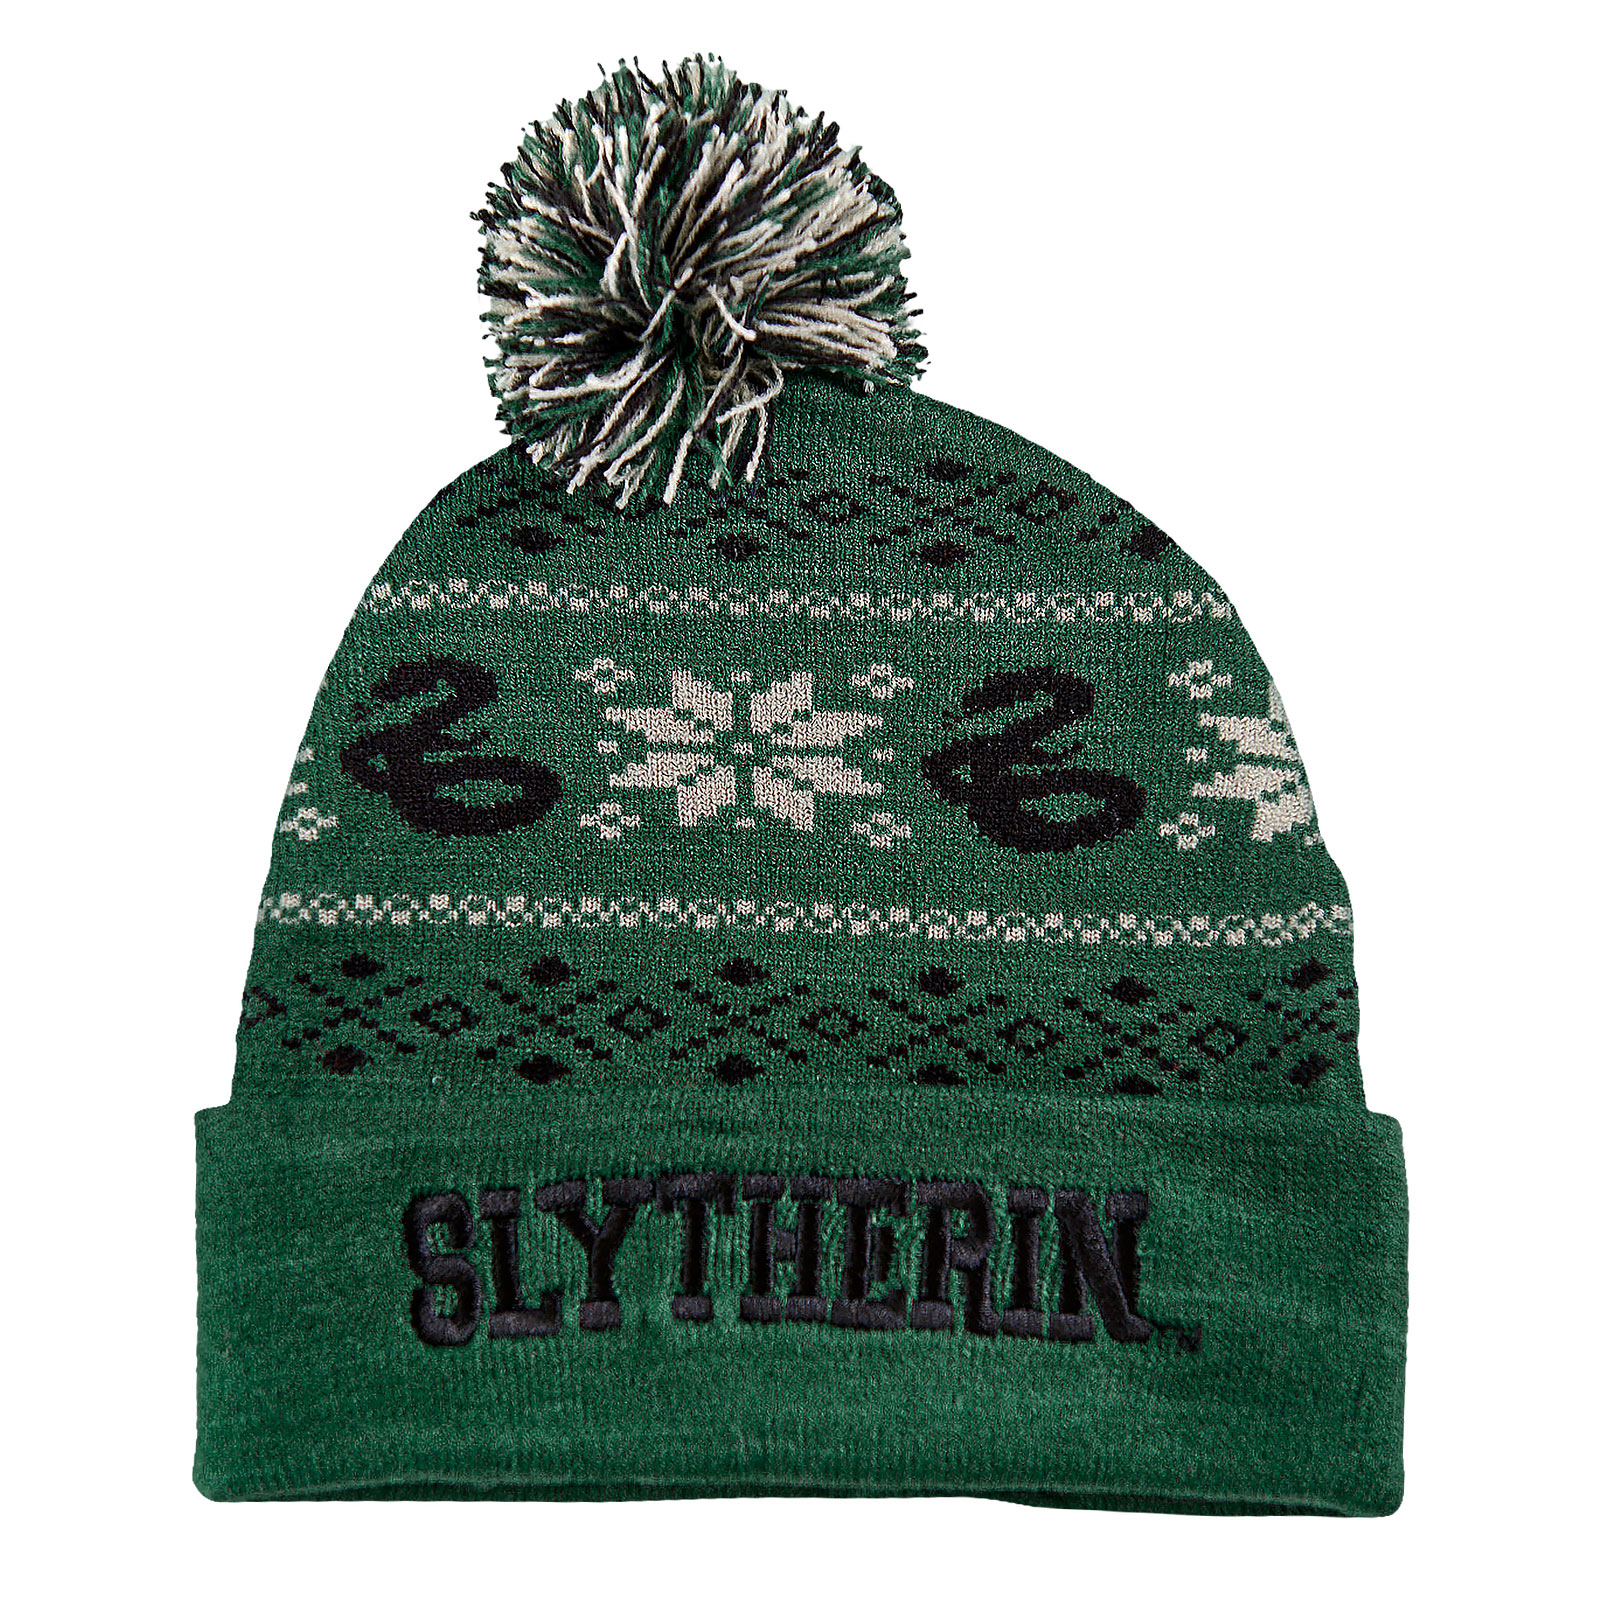 Harry Potter - Slytherin Norwegermütze grün